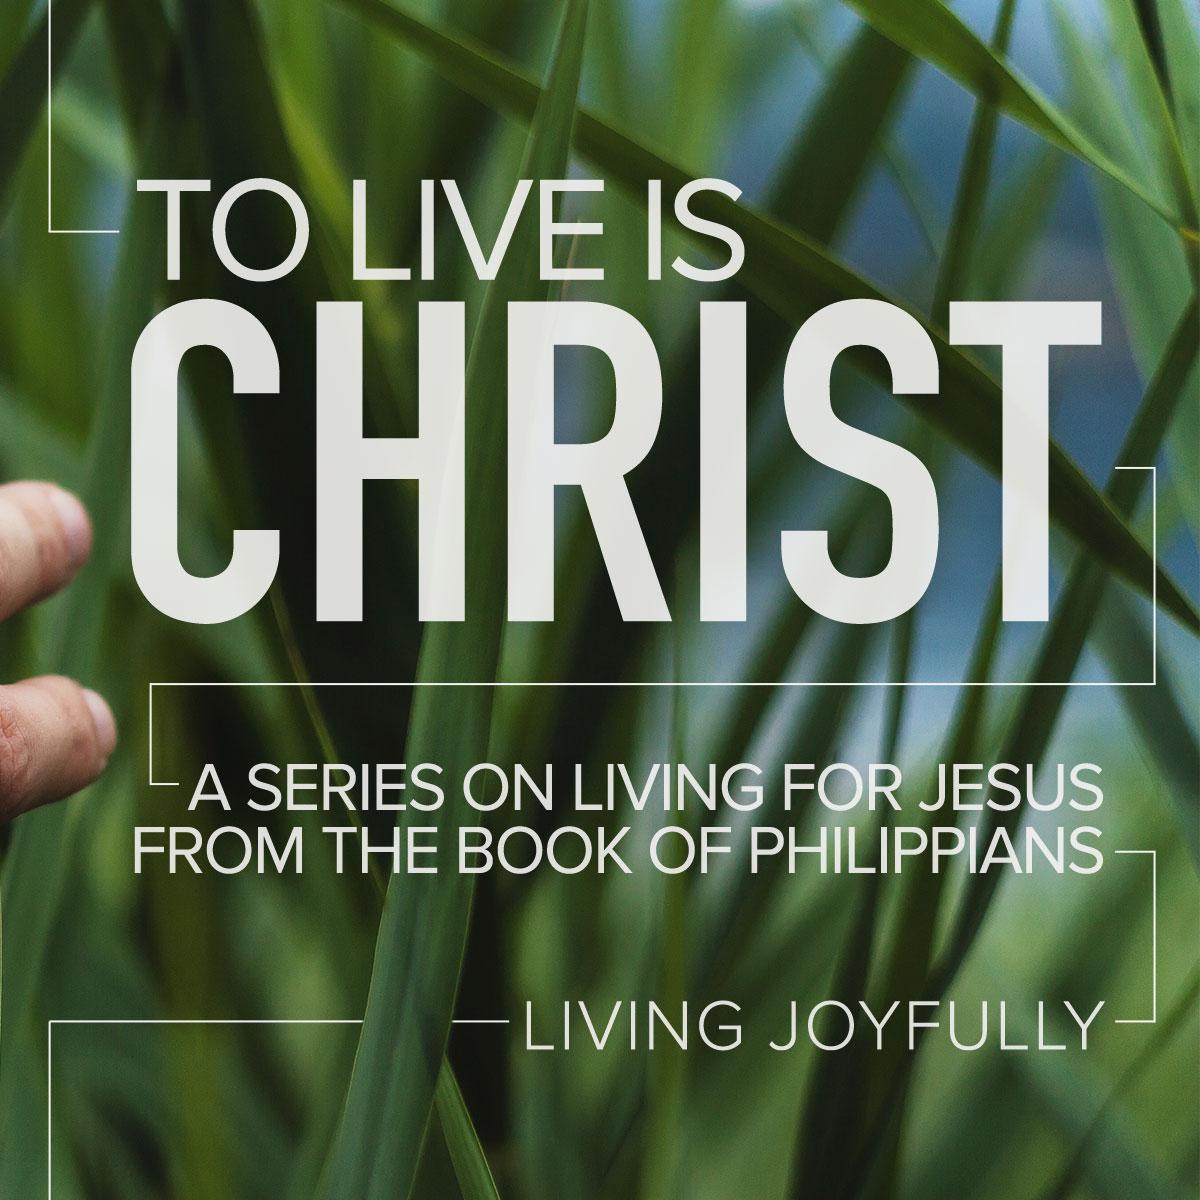 To Live is CHRIST. Part 1: Living Joyfully